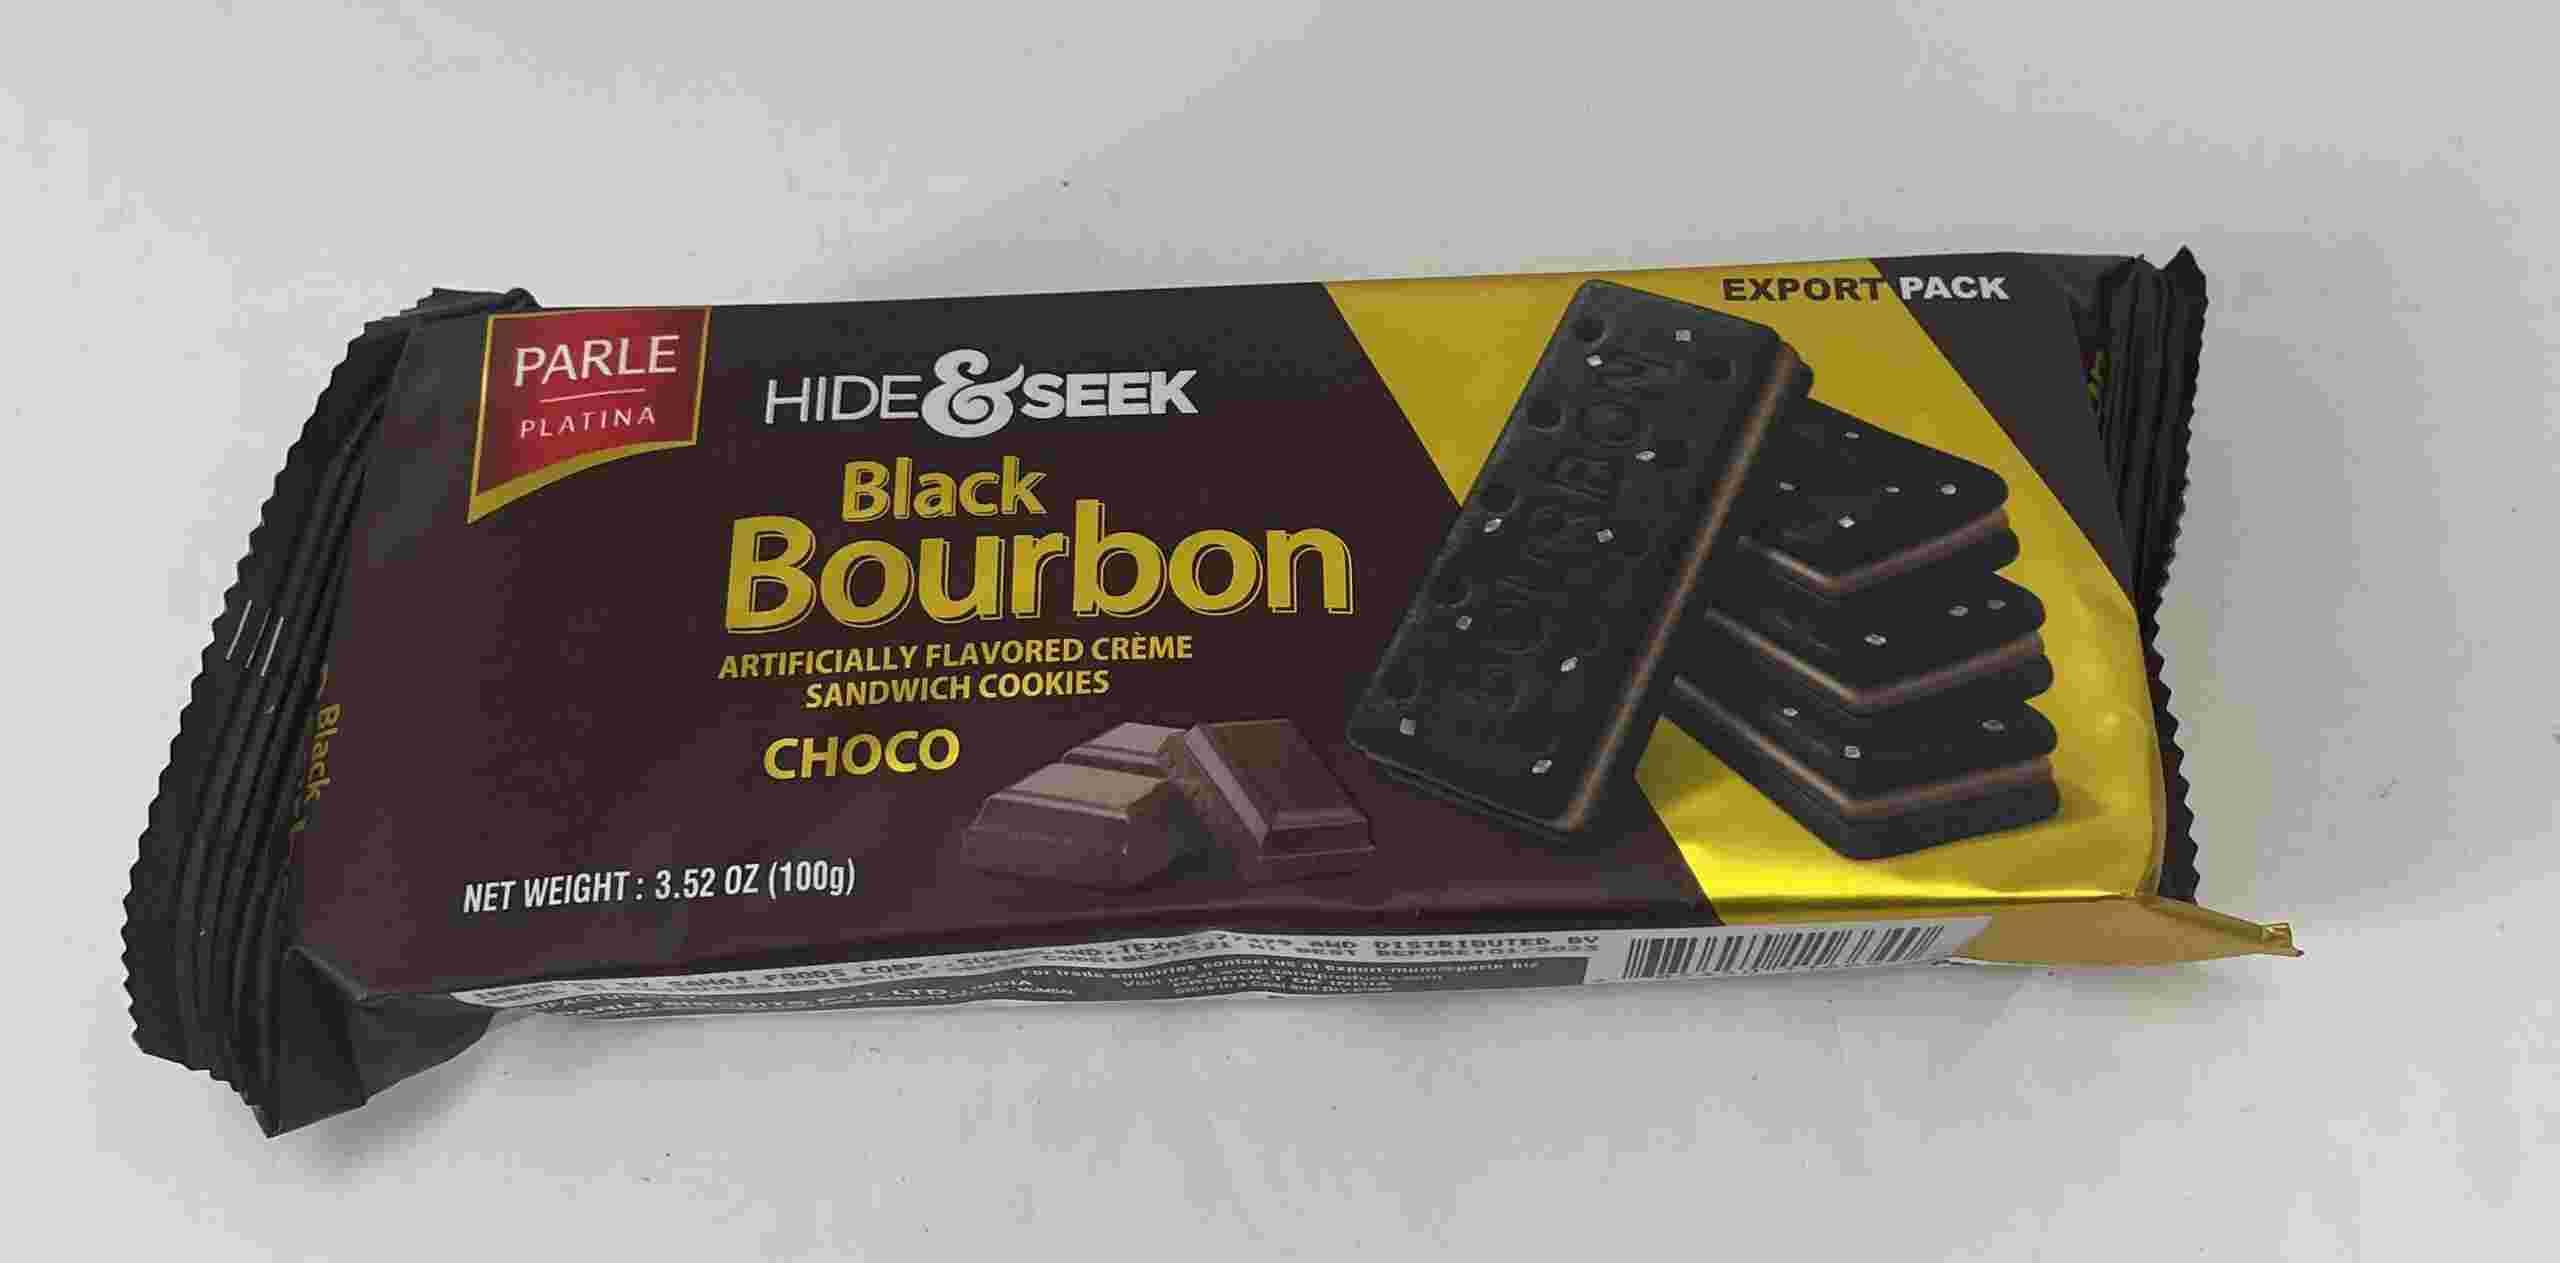 Parle Hide & Seek Black Bourbonn Choco